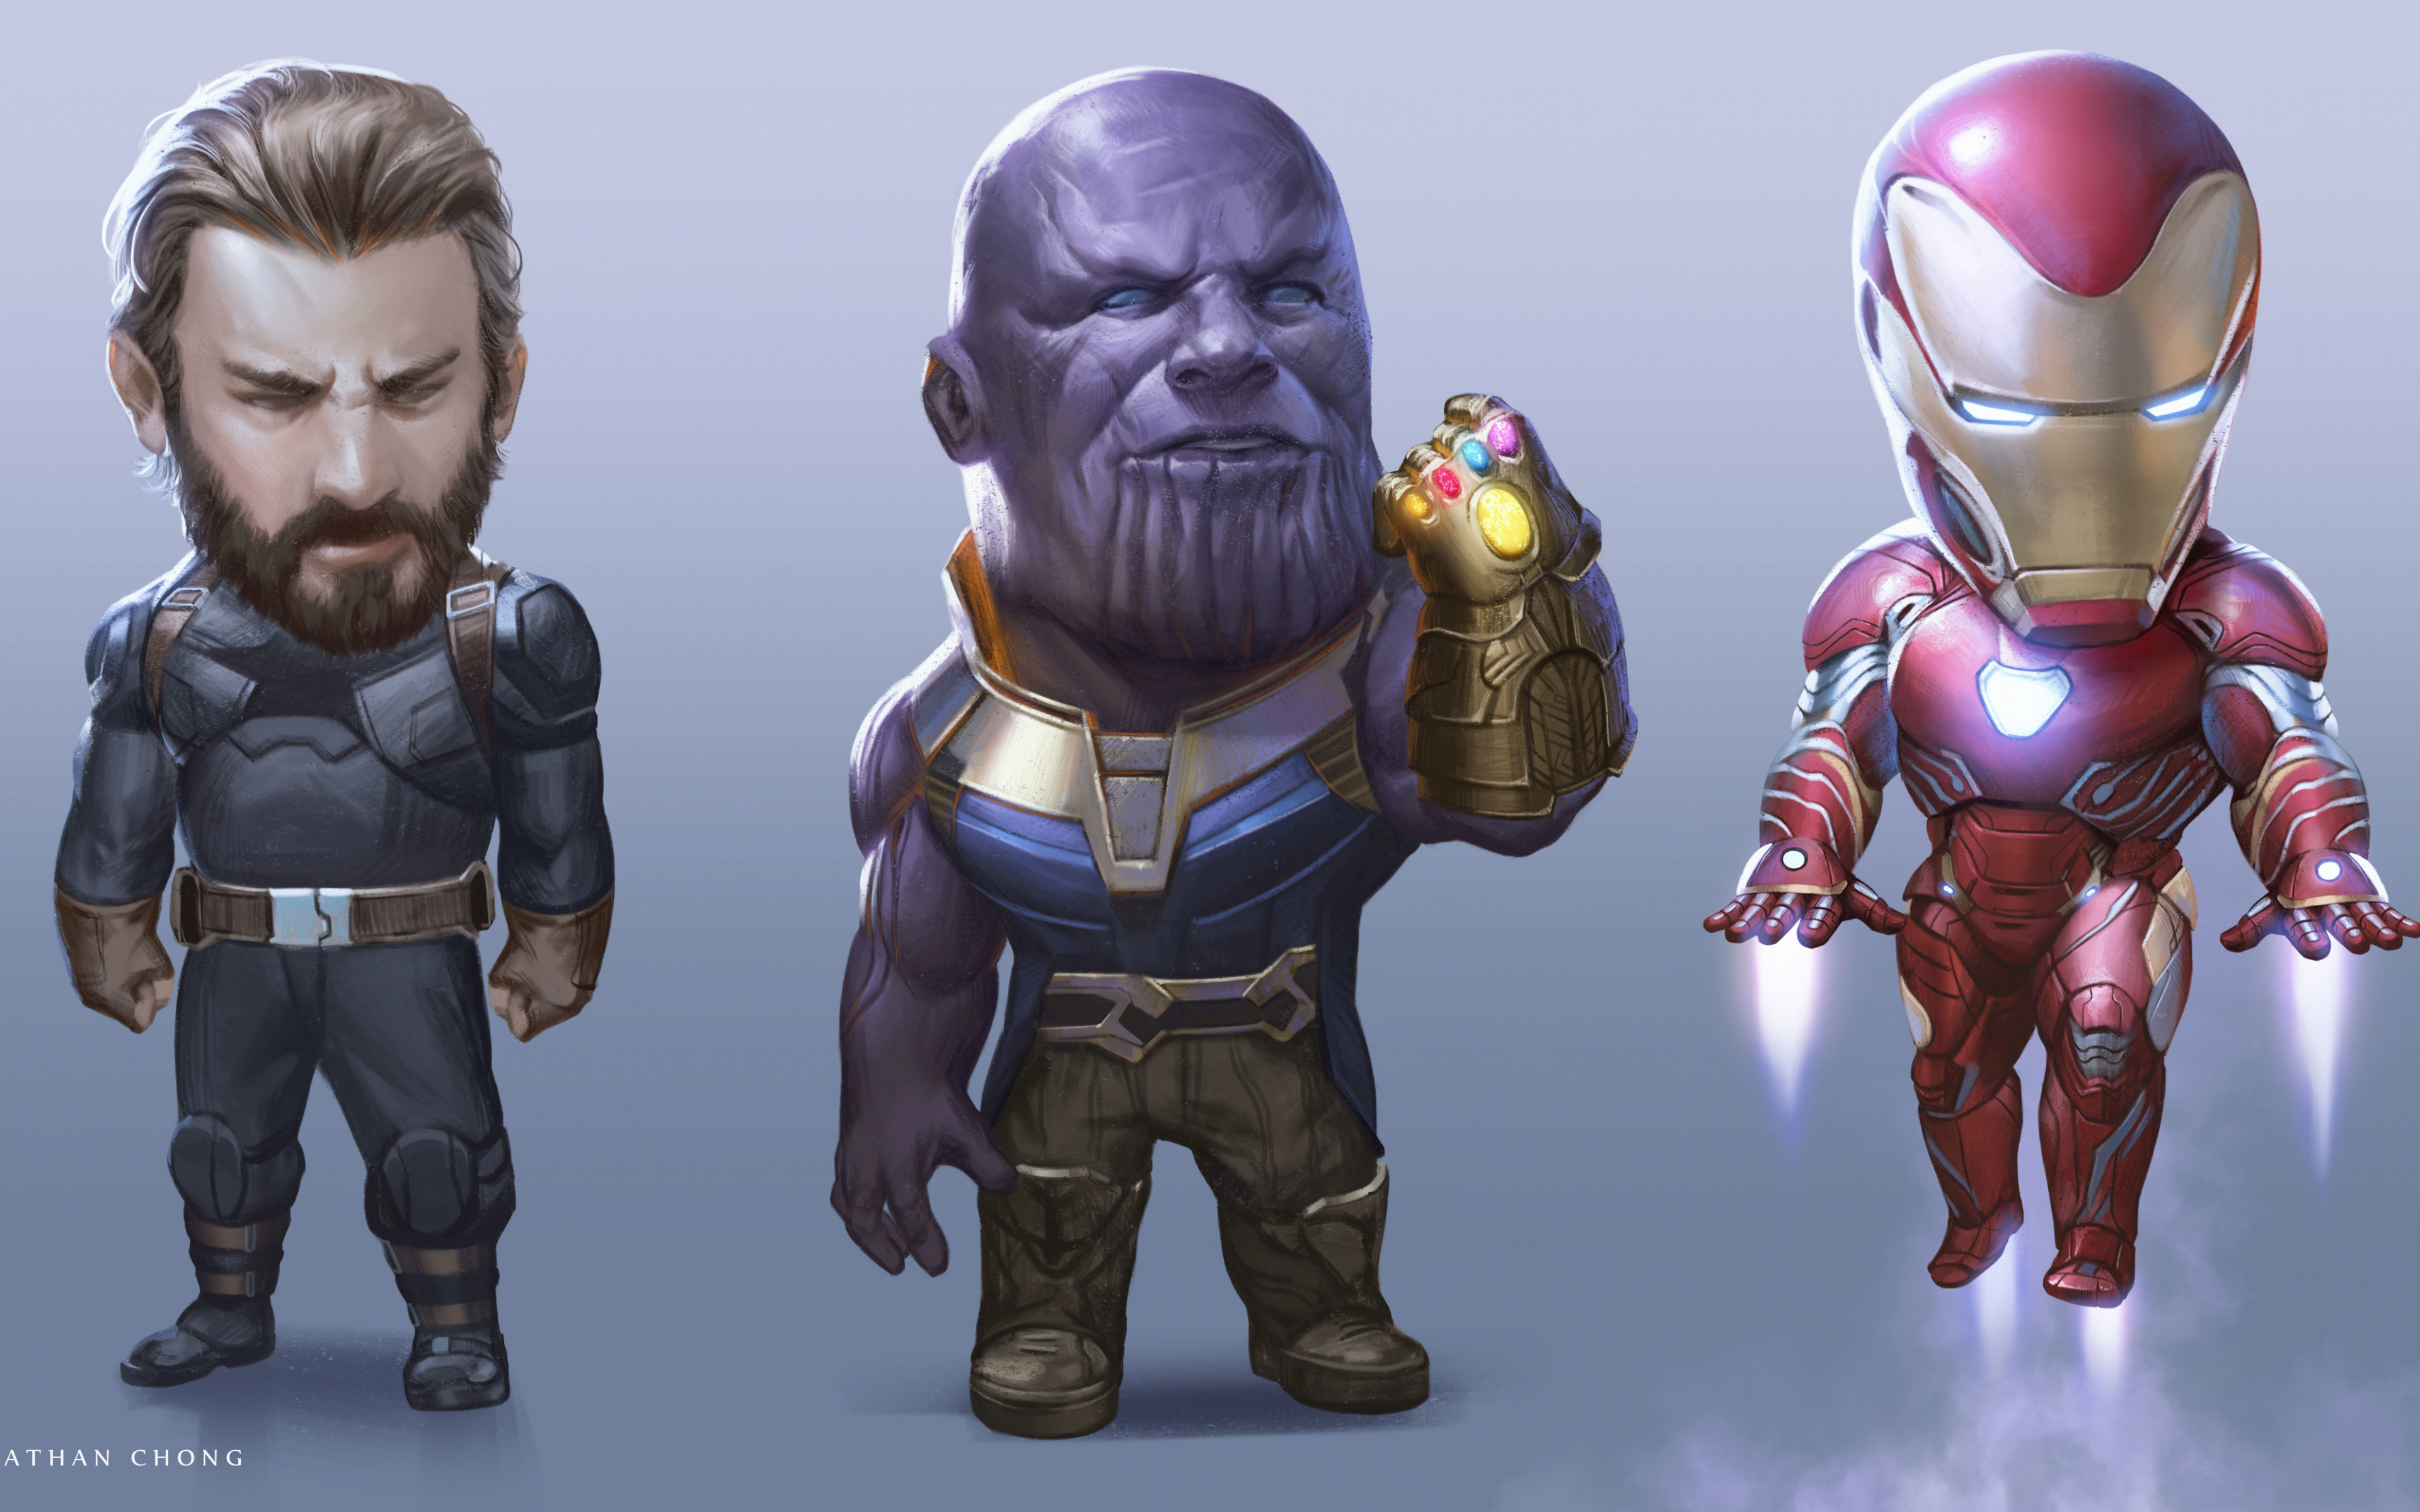 Download 3840x2400 Wallpaper Captain America Thanos Iron